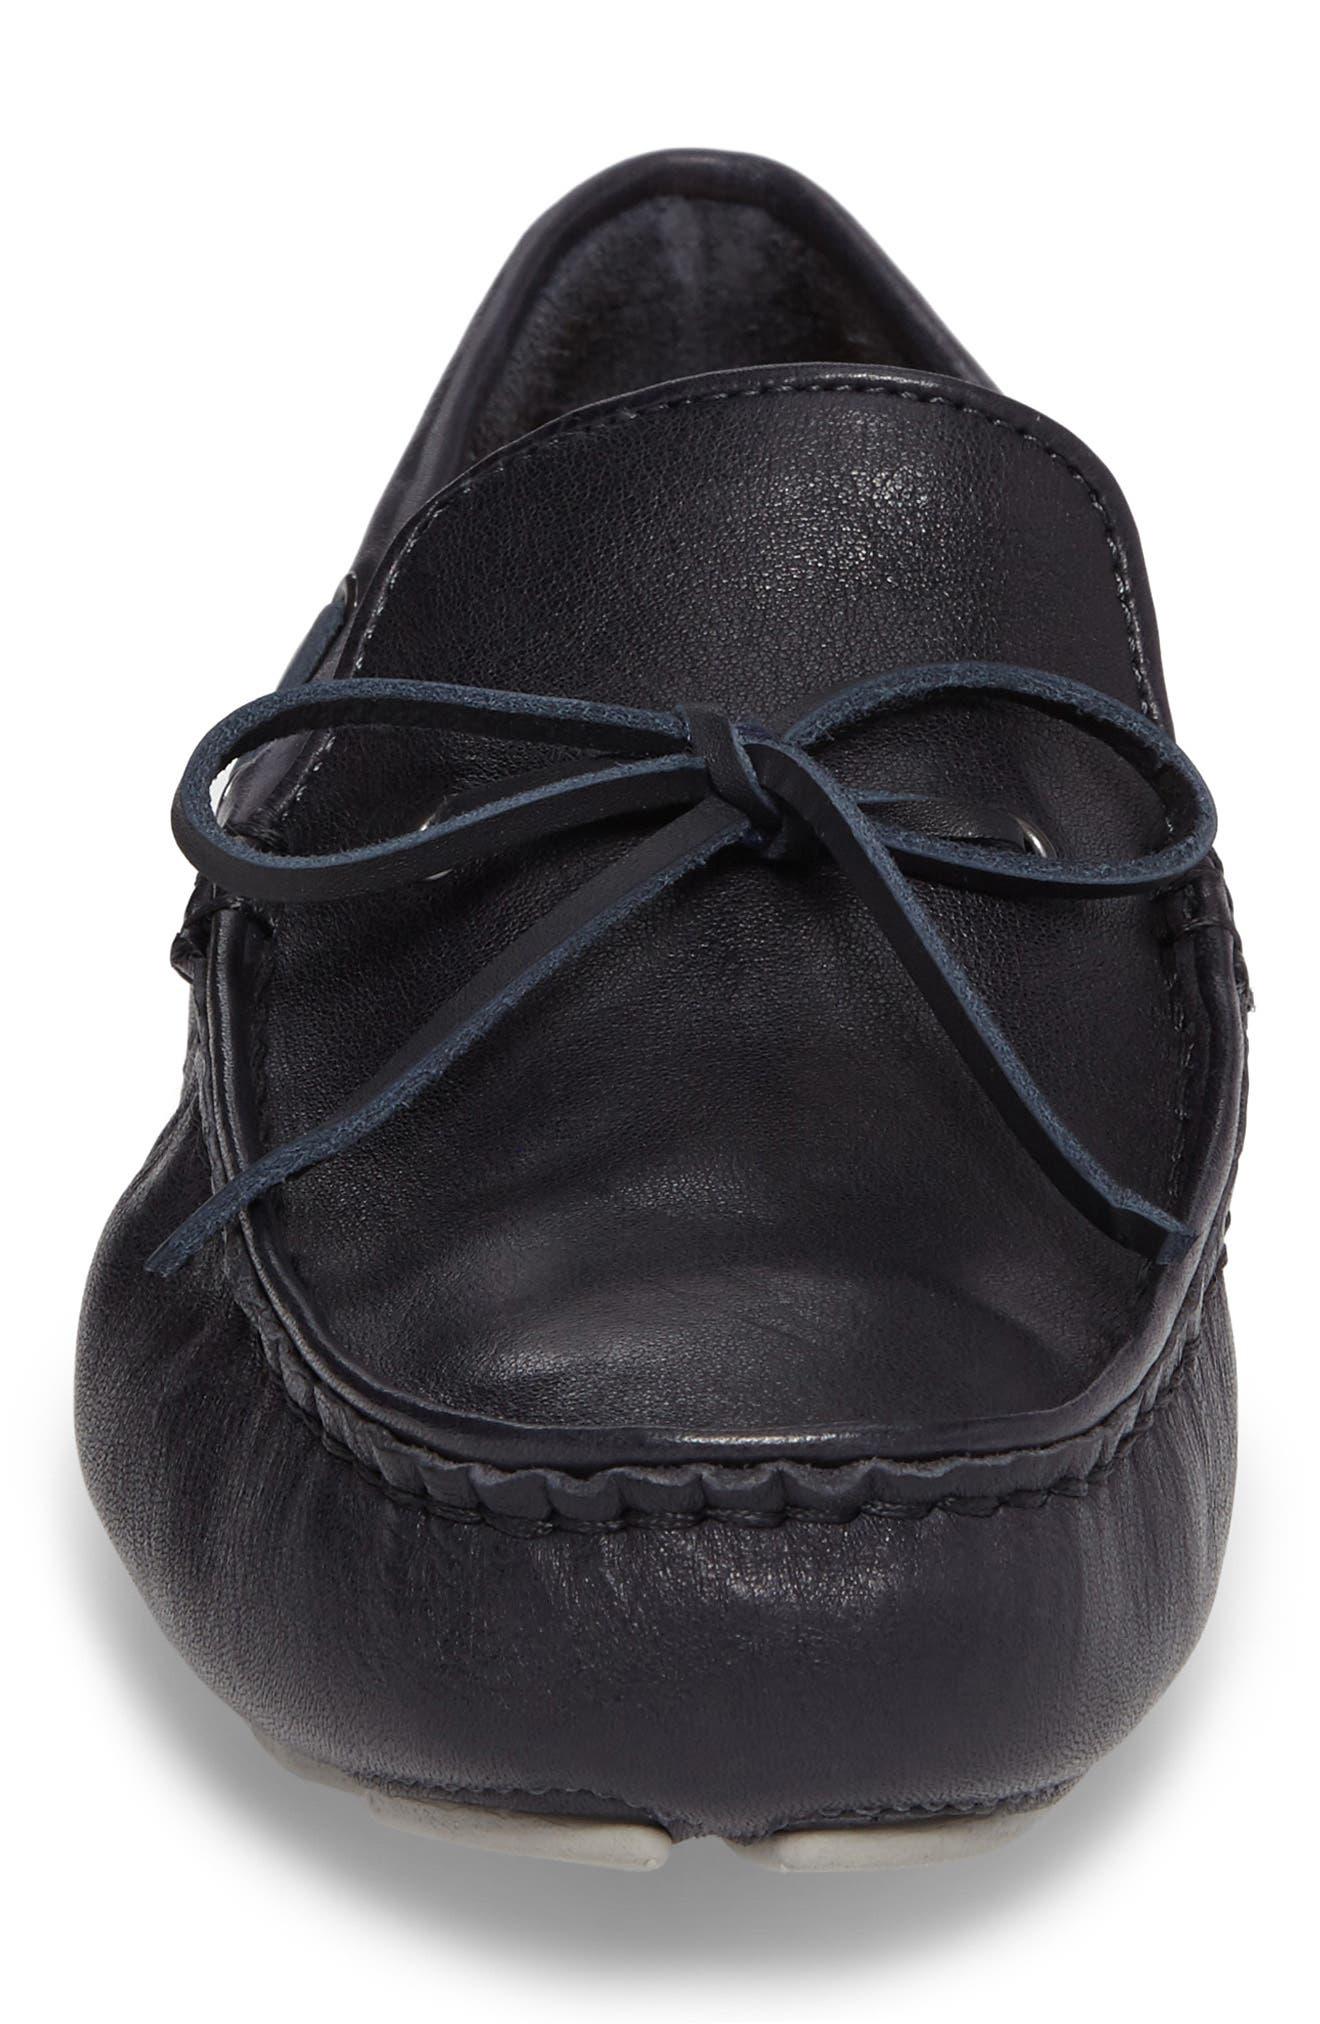 Everton Driving Shoe,                             Alternate thumbnail 4, color,                             Navy